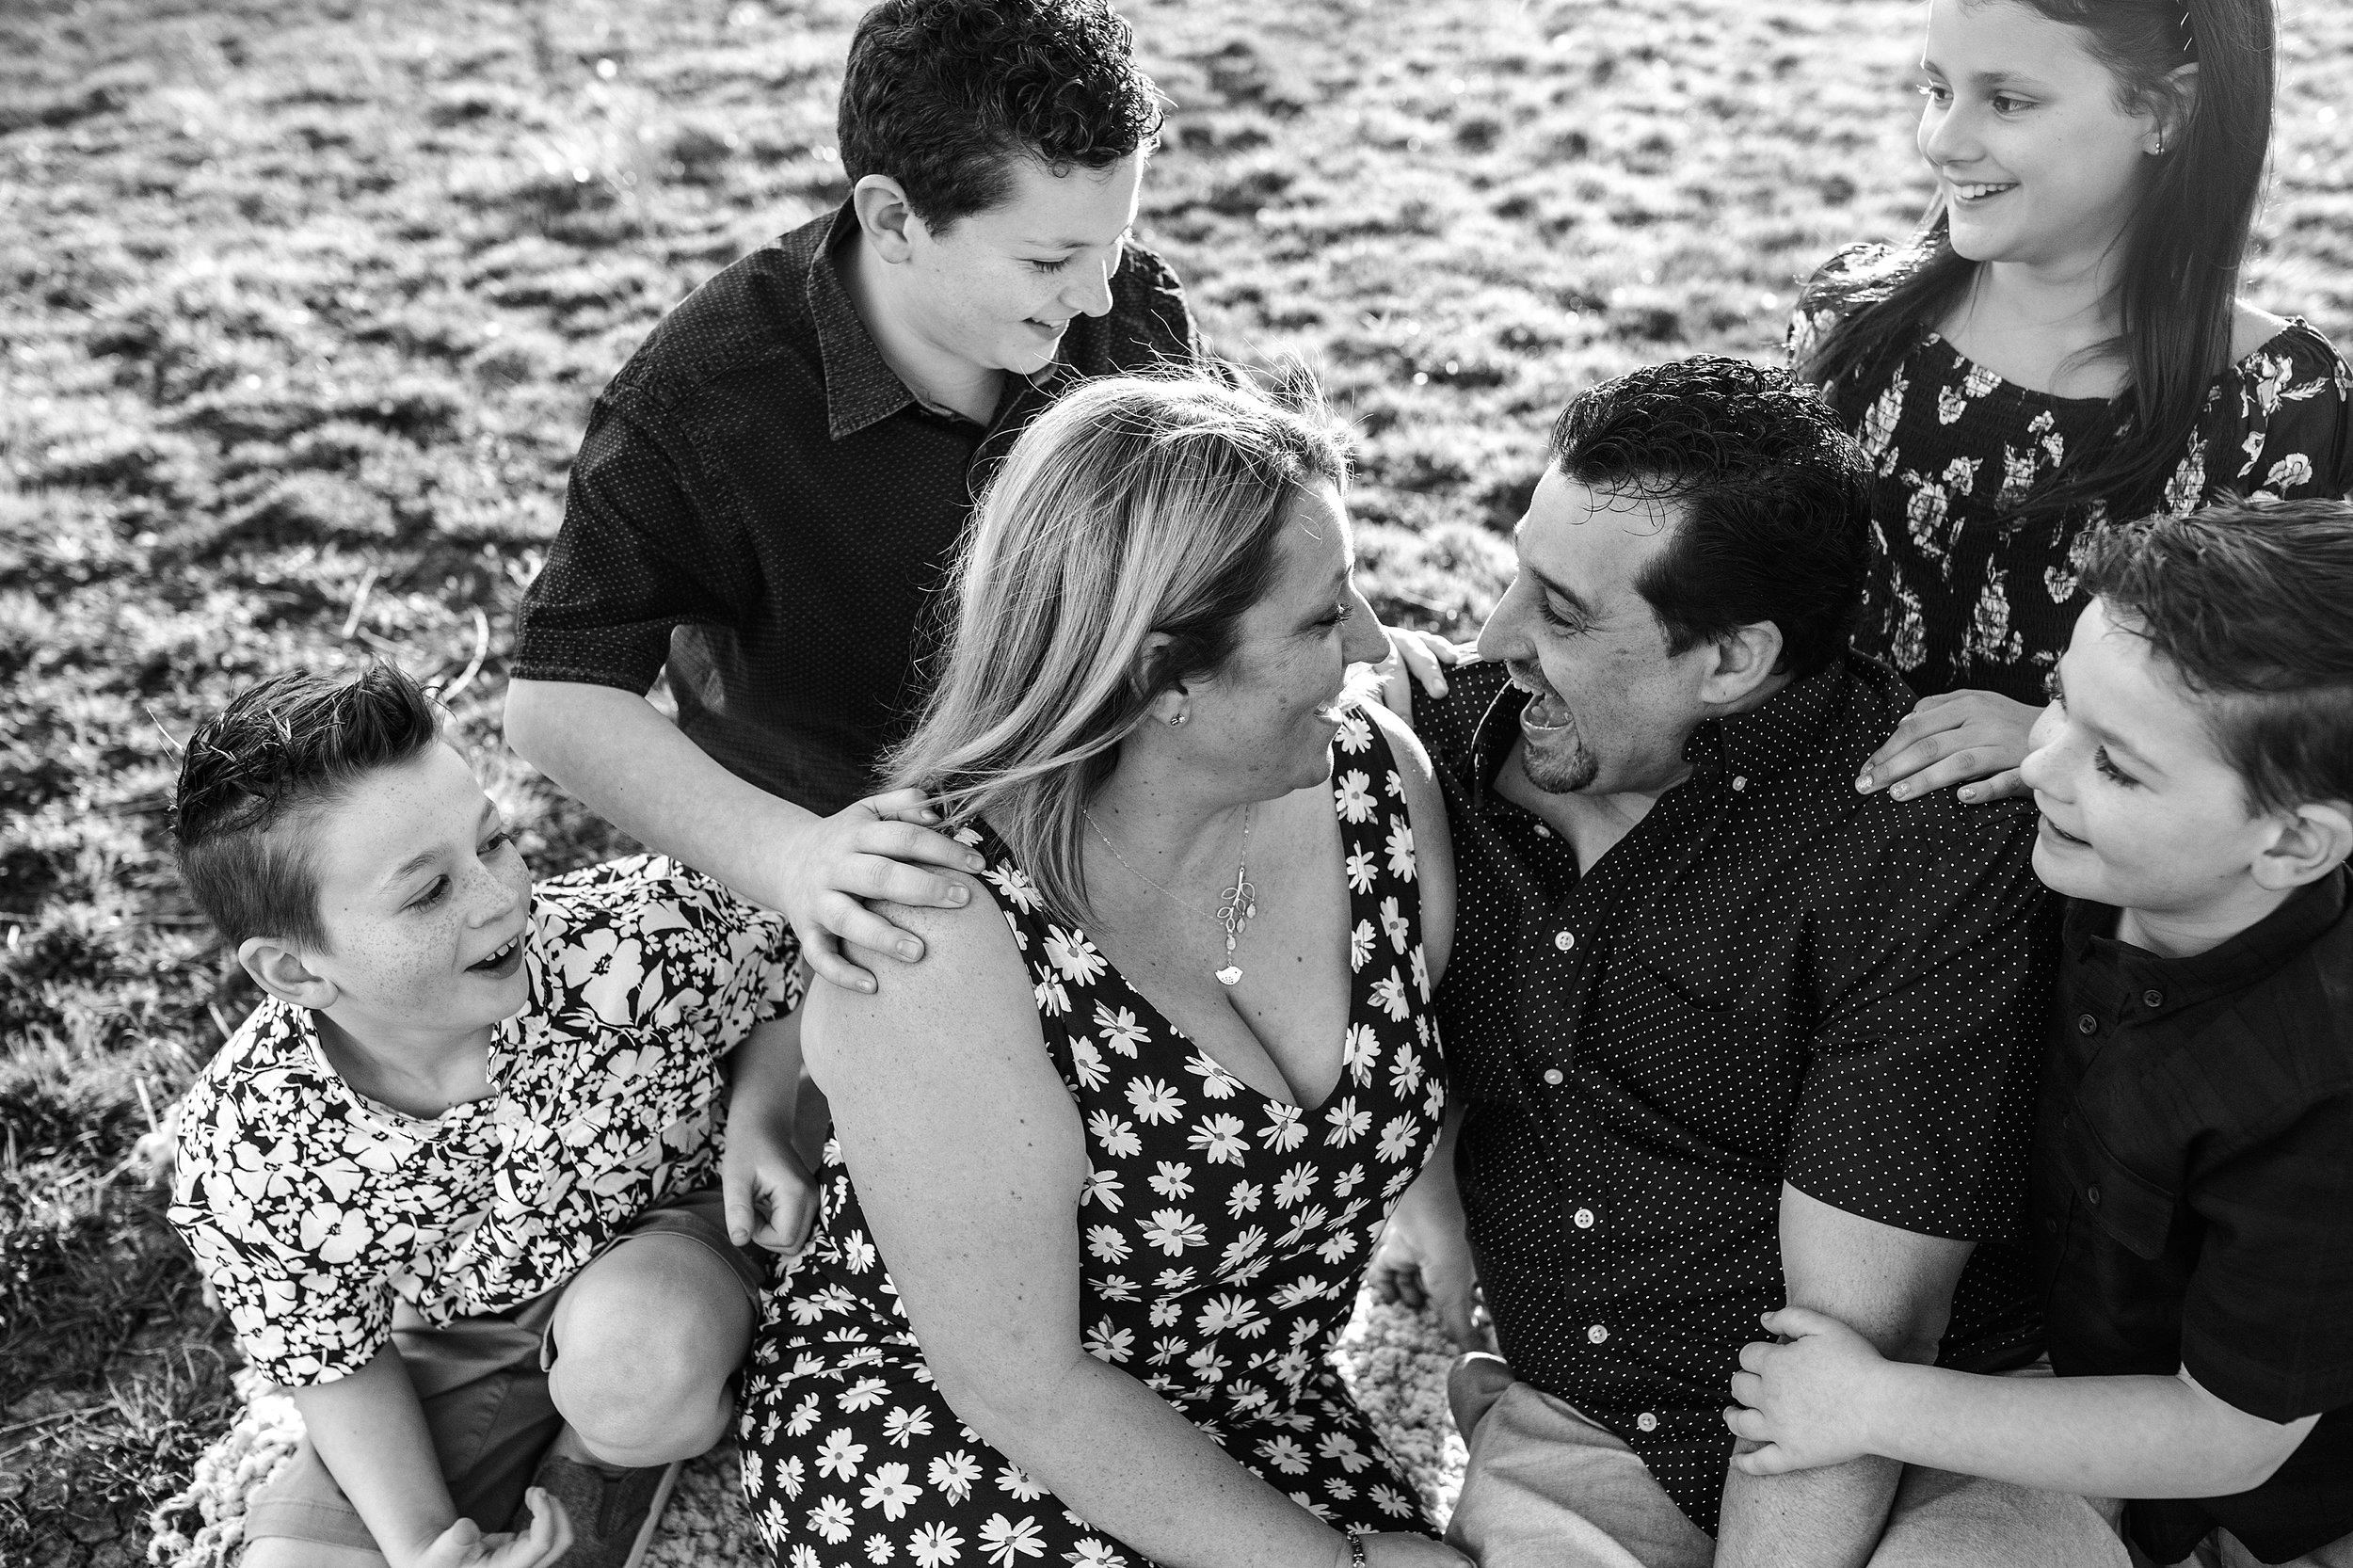 Lehigh-Valley-Family-Photographer_0015.jpg